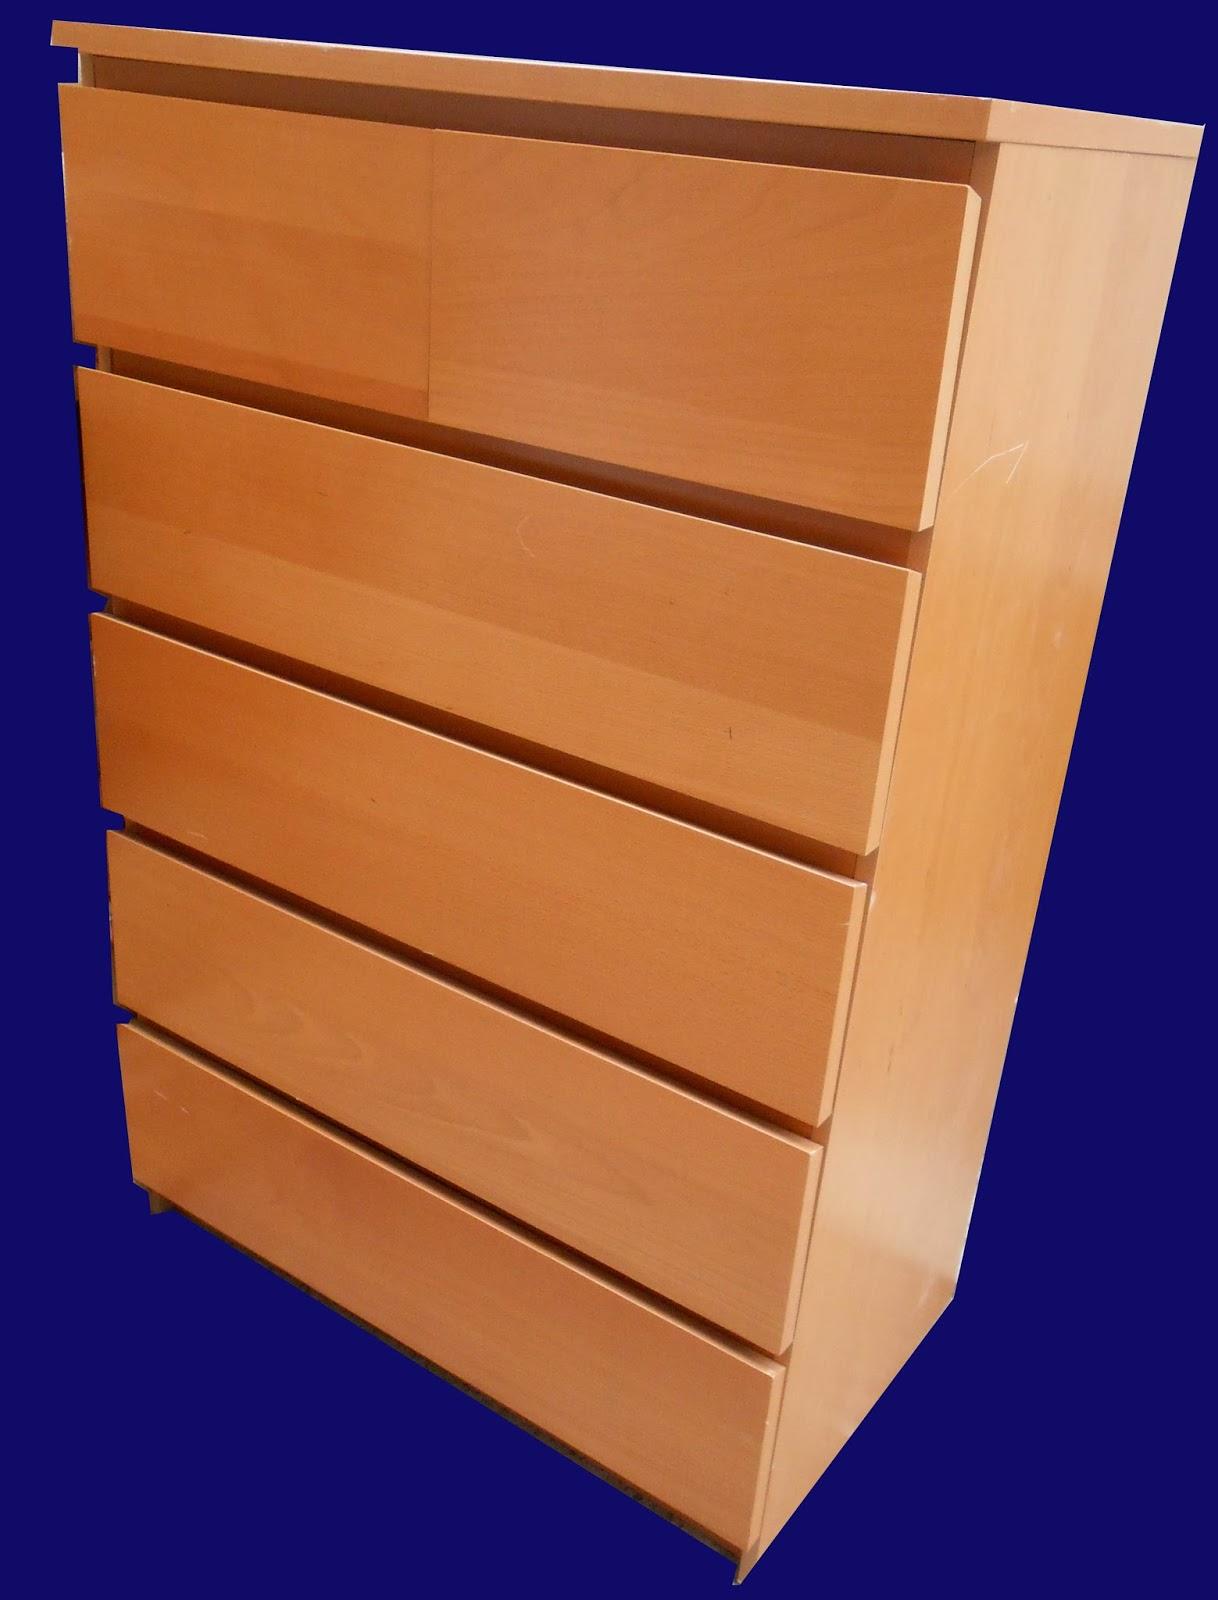 Uhuru Furniture Collectibles Ikea Malm Chest Sold